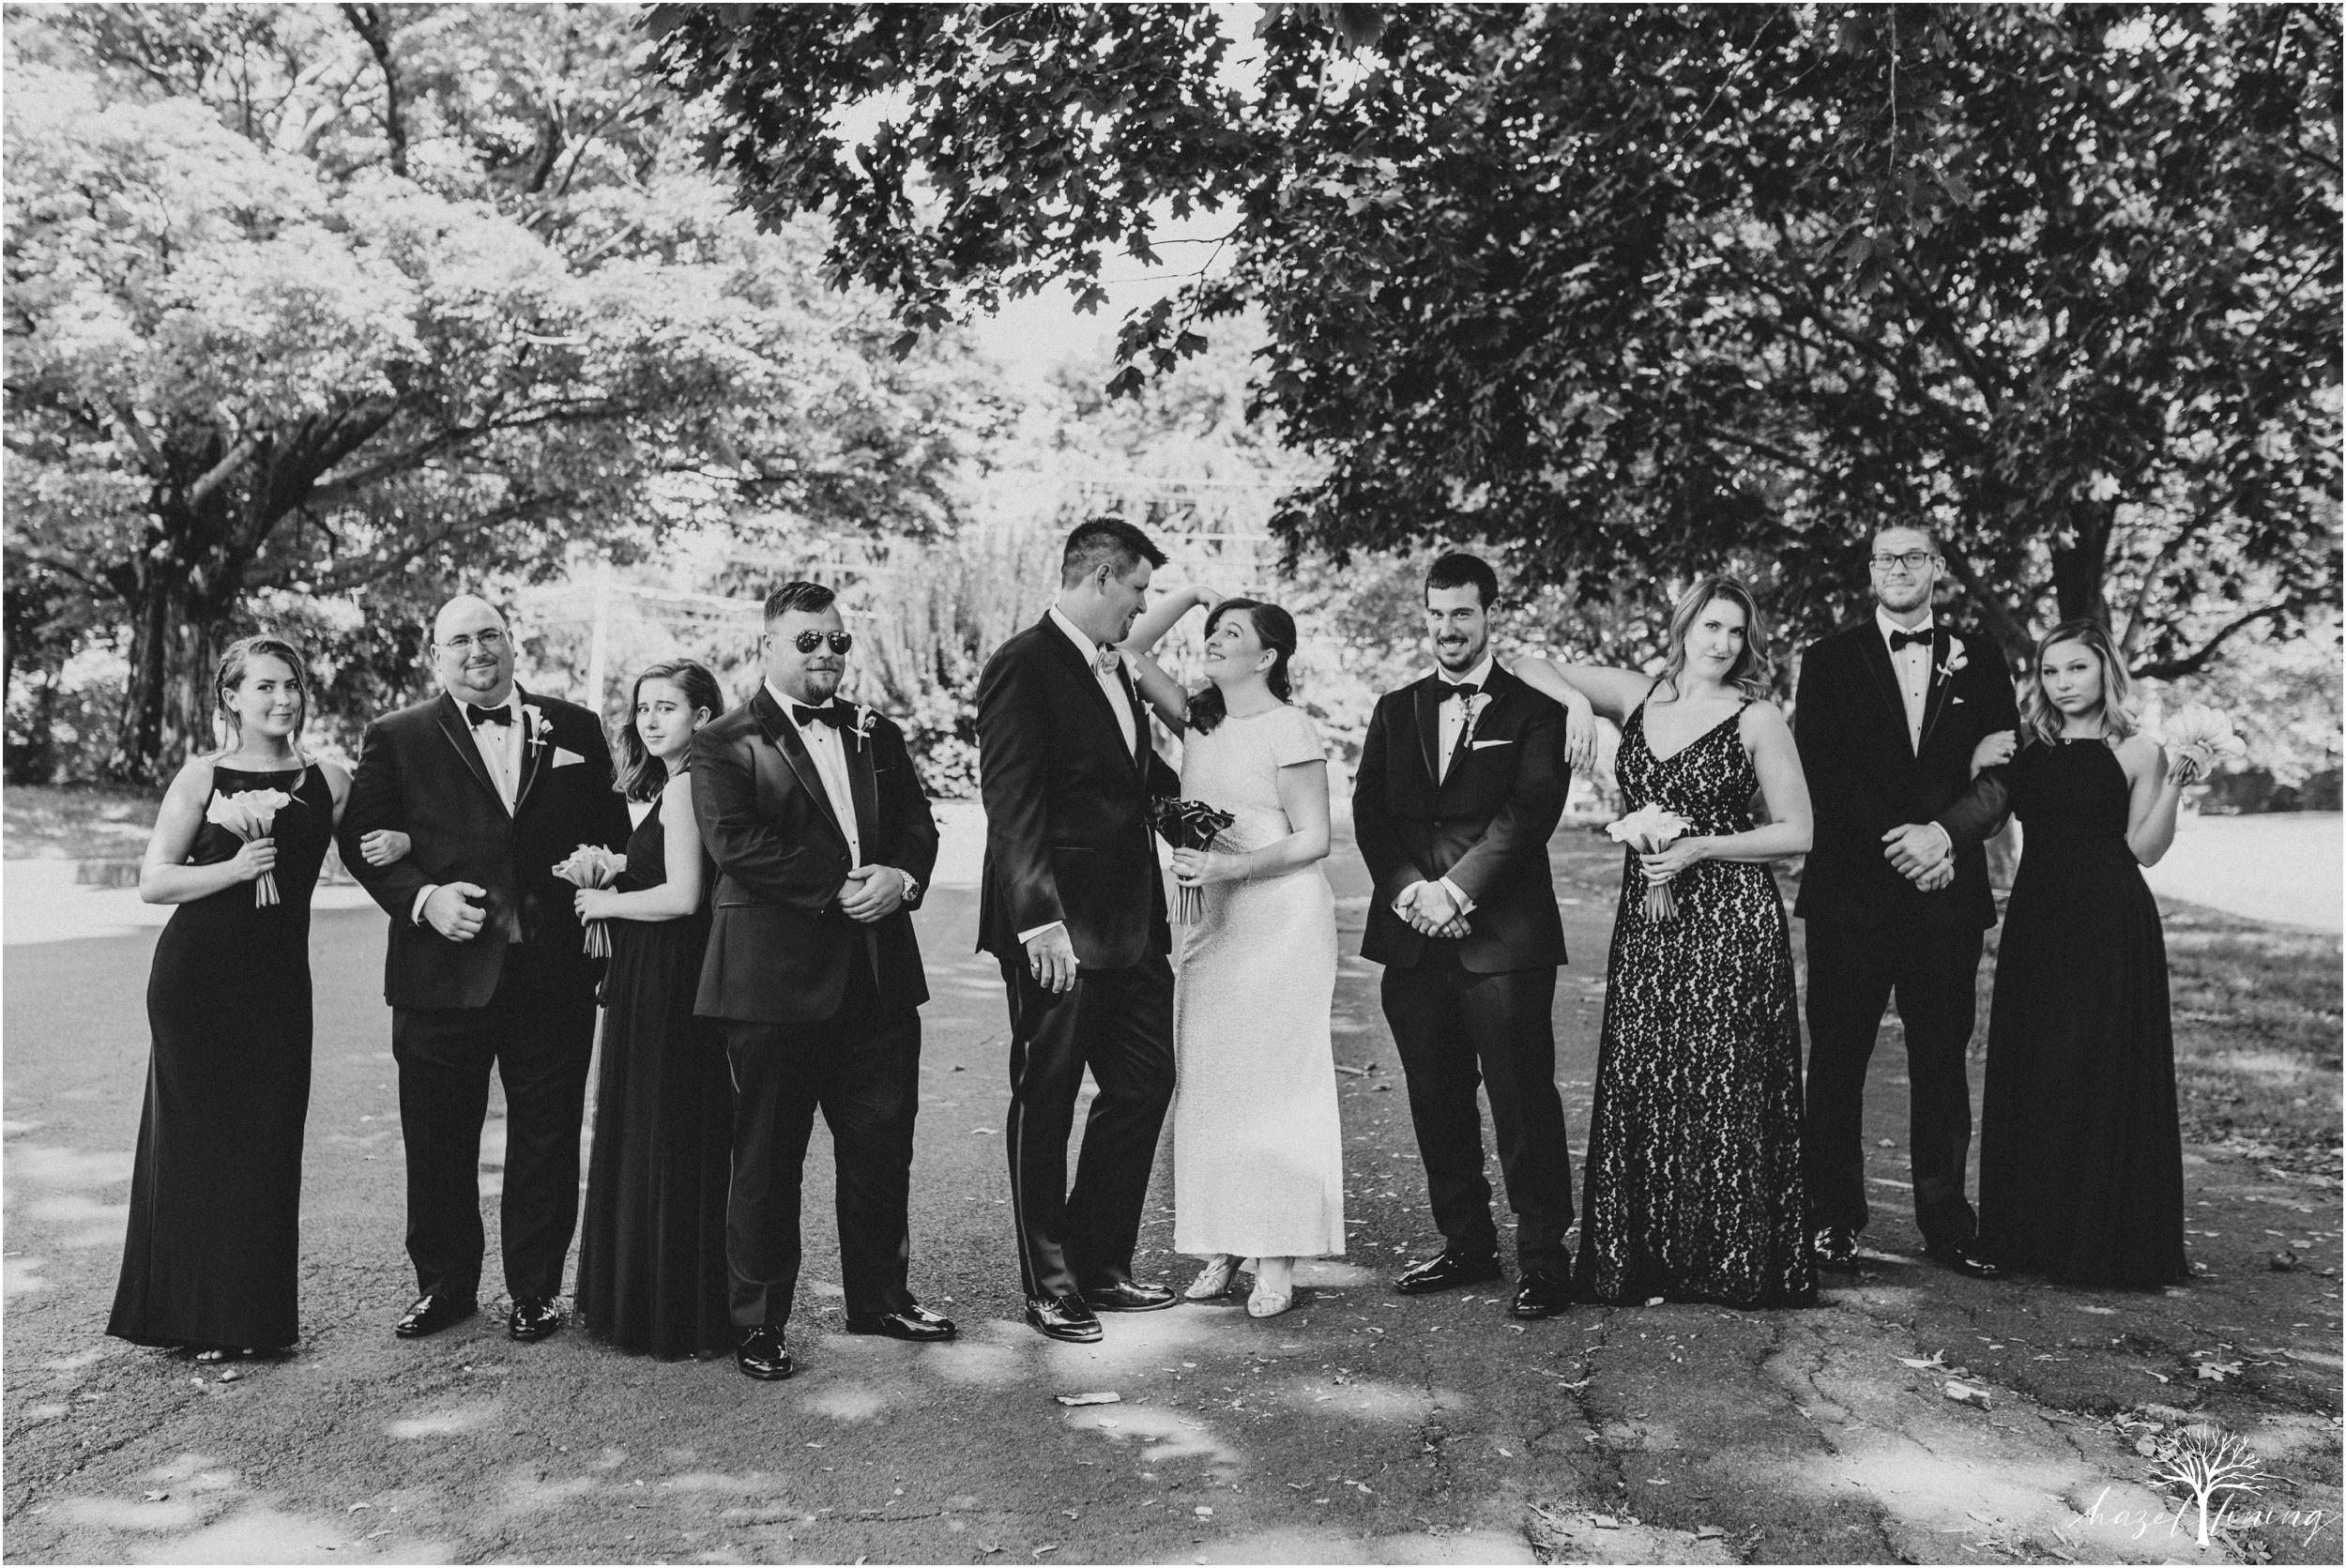 elizabeth-doelp-andrew-foreback-middletown-country-club-summer-langhorne-pennsylvania-wedding-hazel-lining-travel-wedding-elopement-photography_0051.jpg